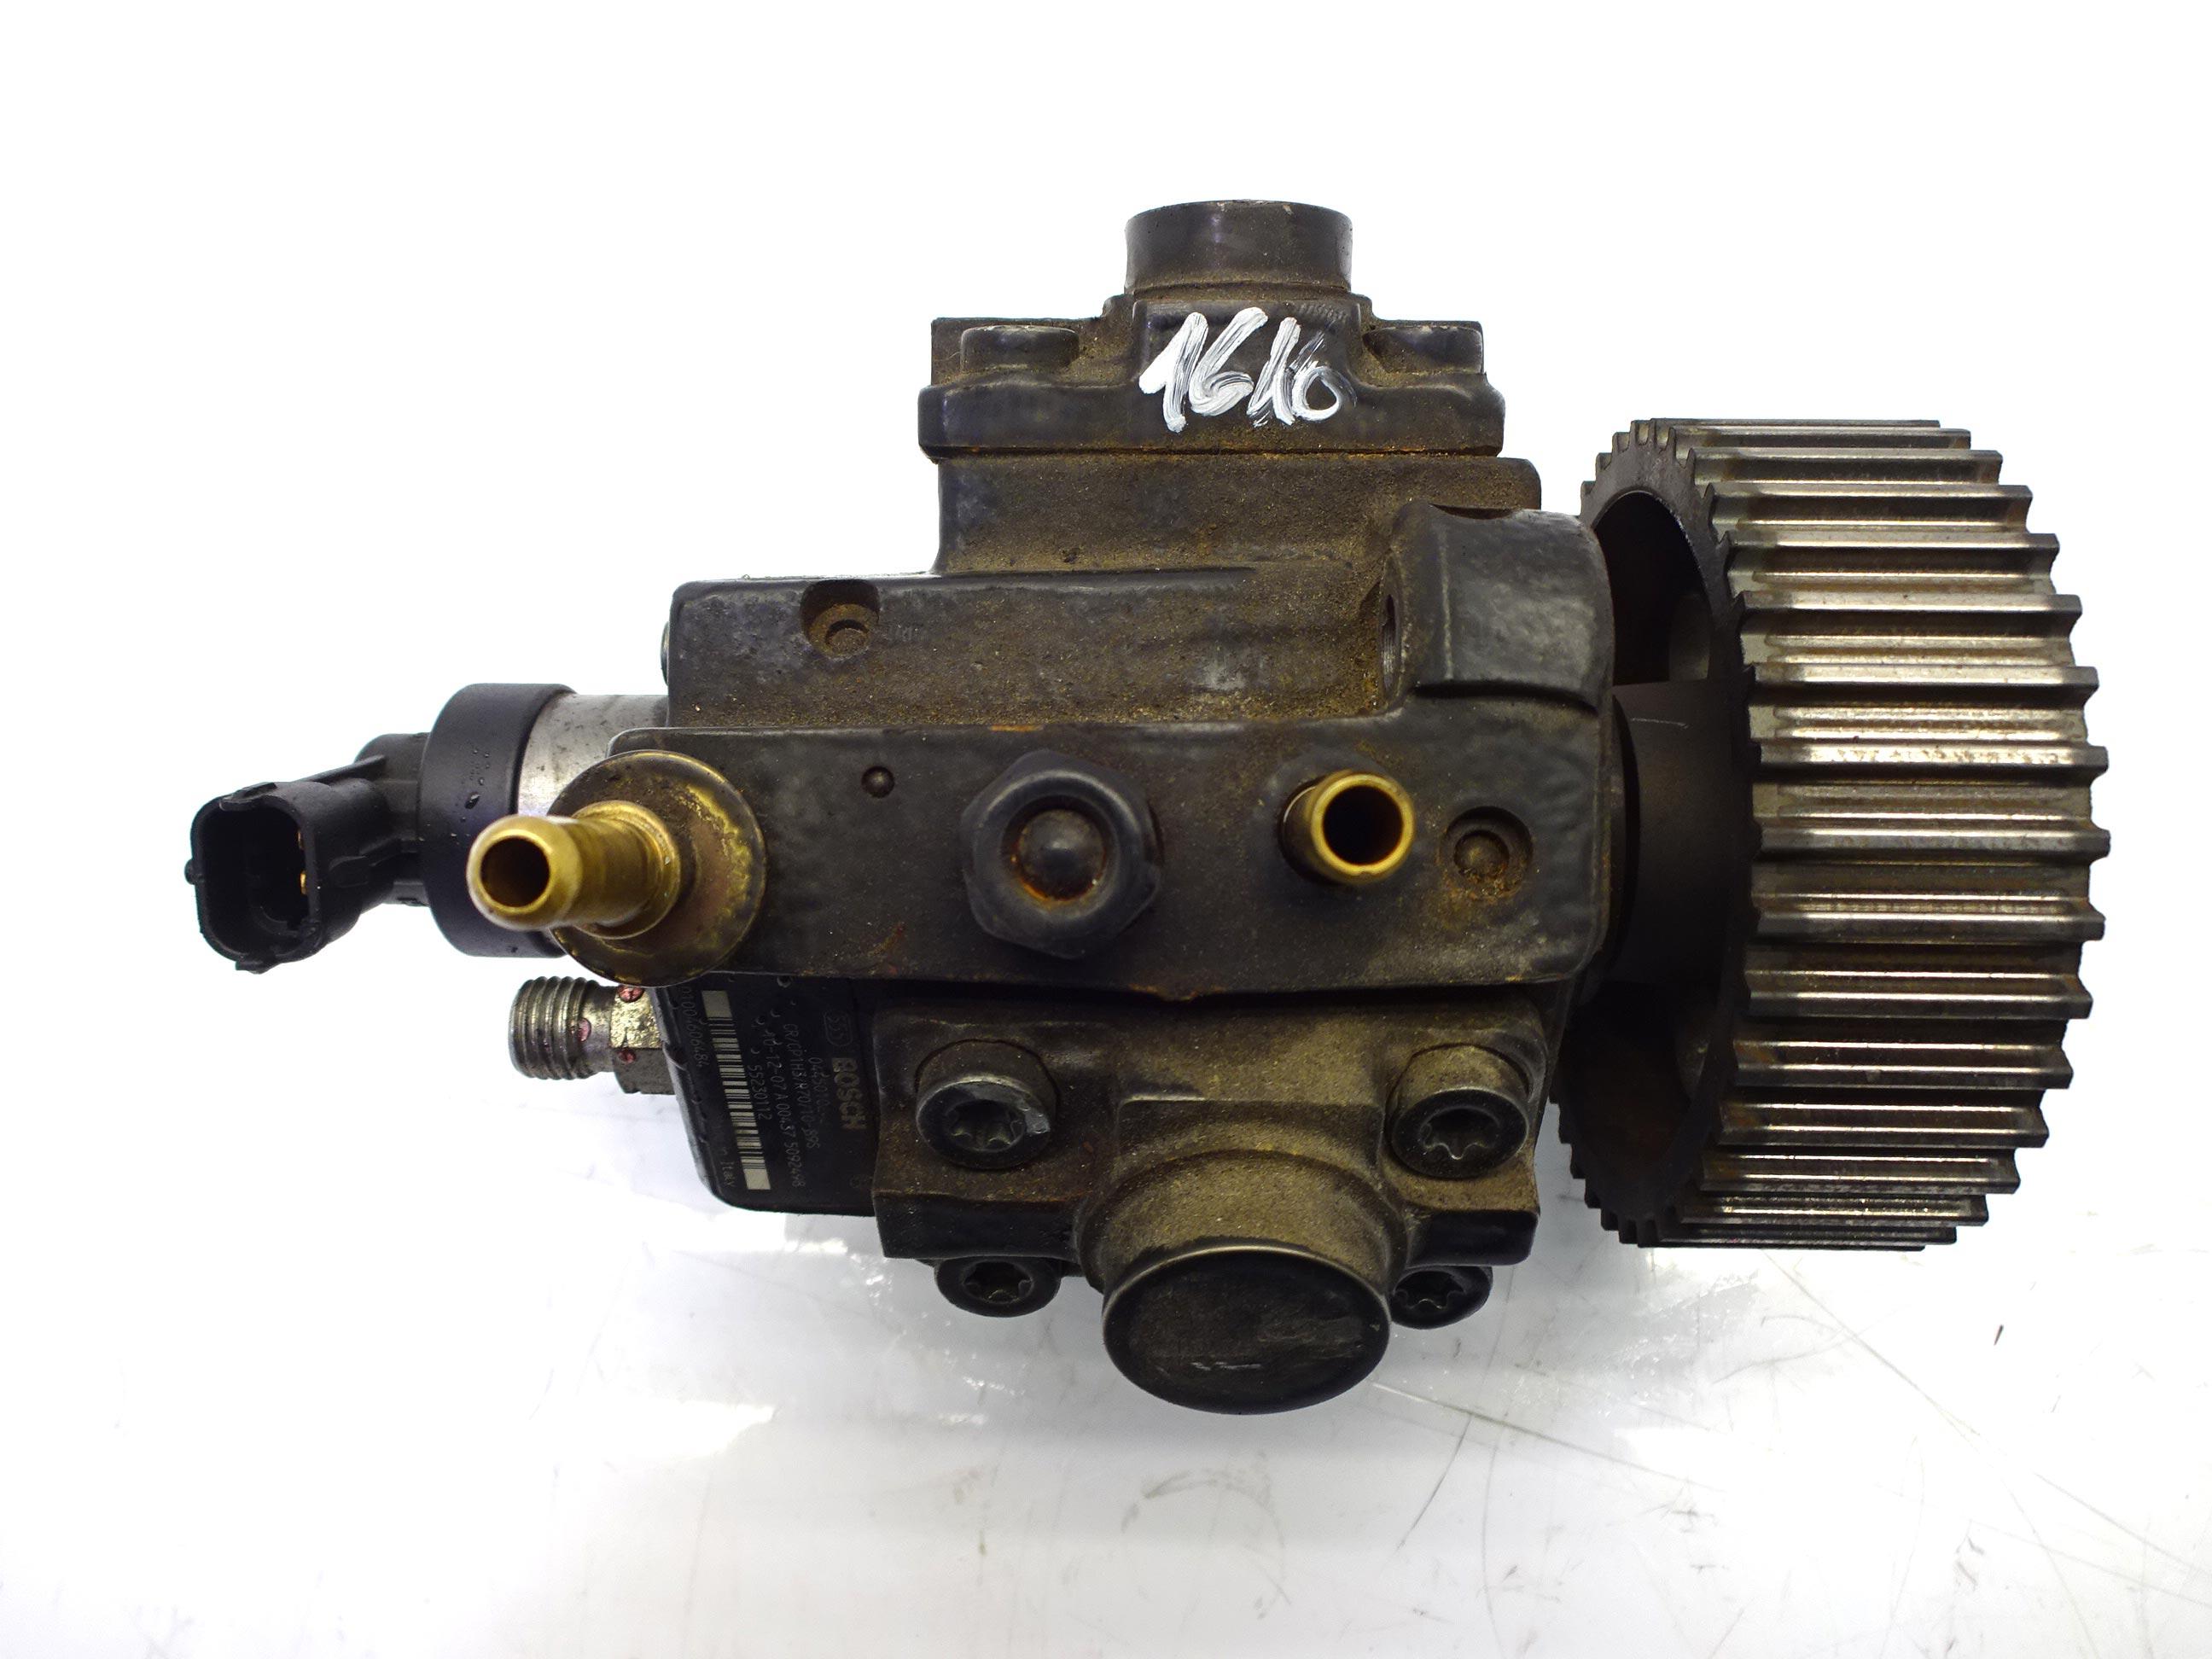 Hochdruckpumpe Alfa Romeo Giulietta 940 2,0 JTDM Diesel 940A4000 55230112